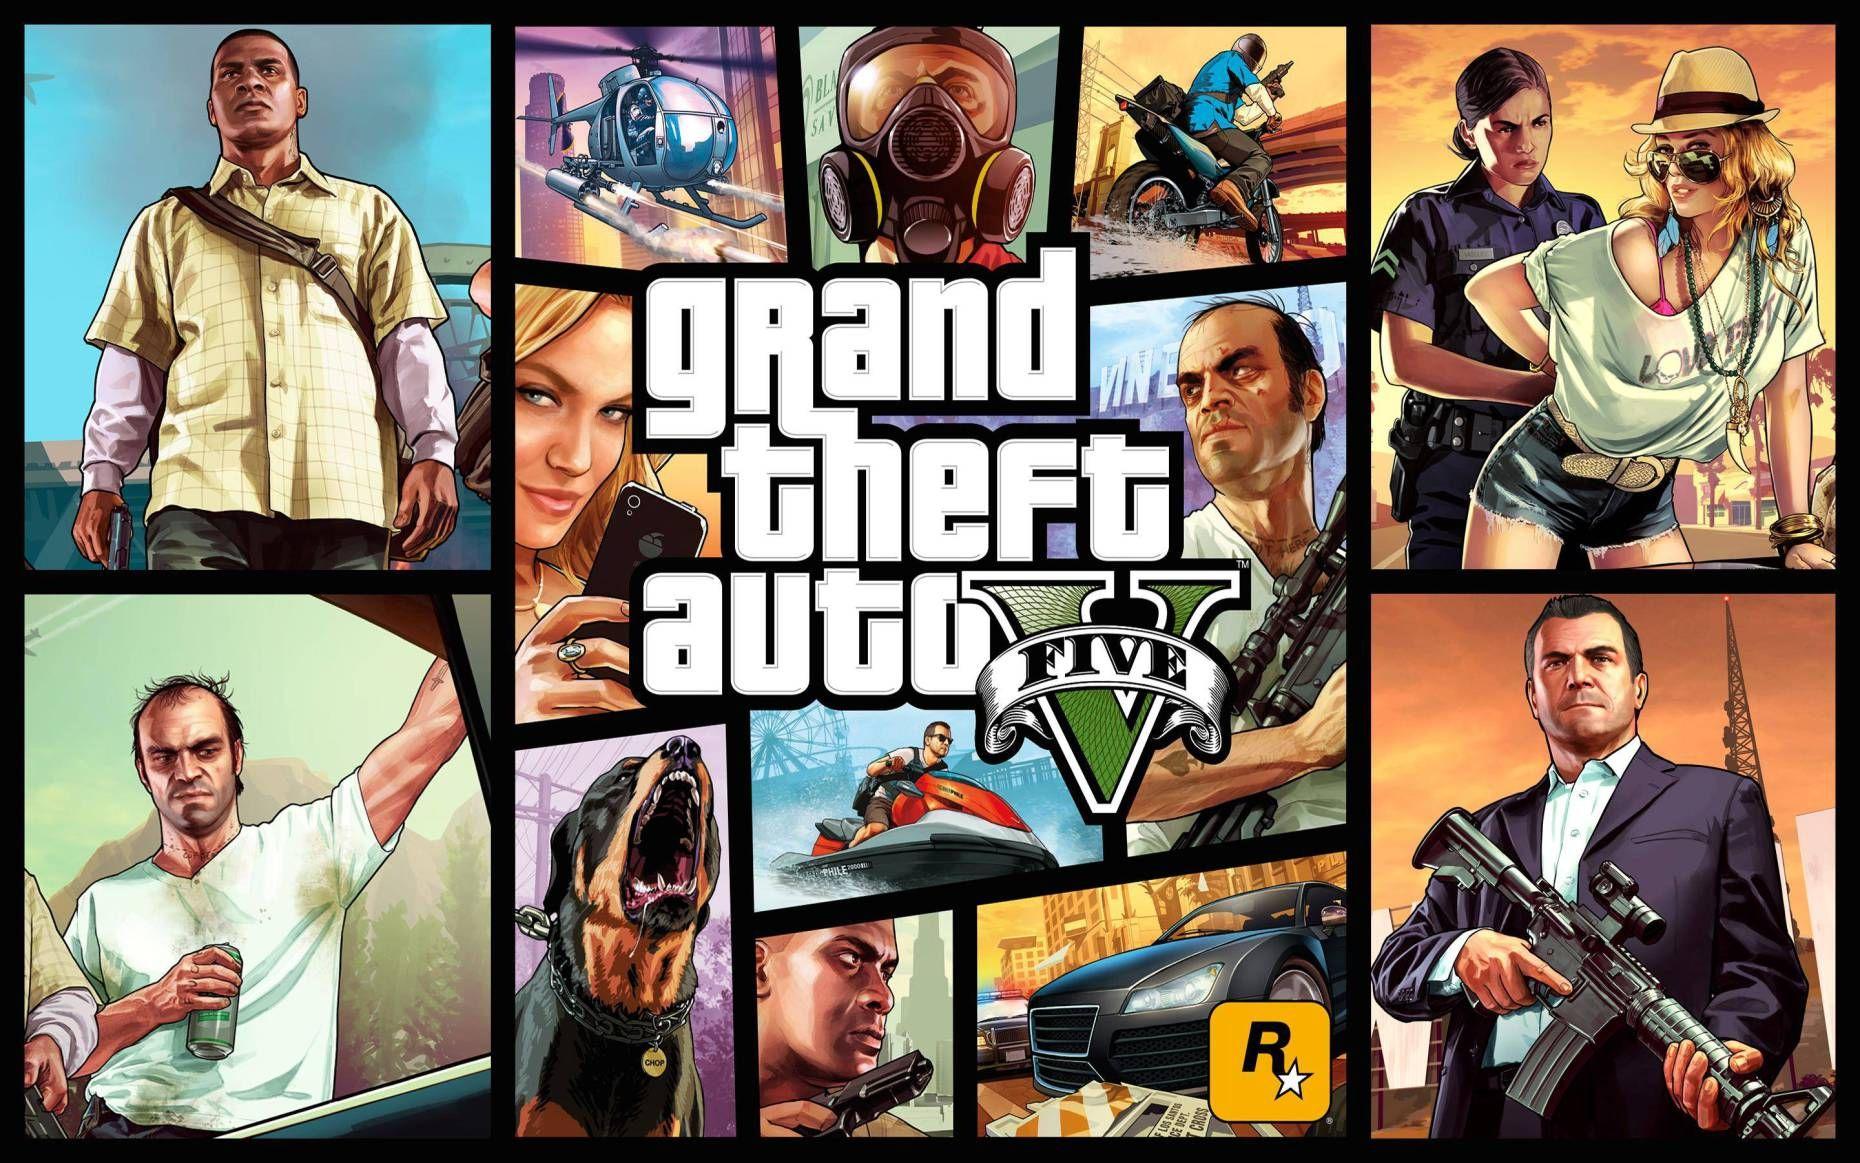 Grand theft auto 5 pc full version free download grand